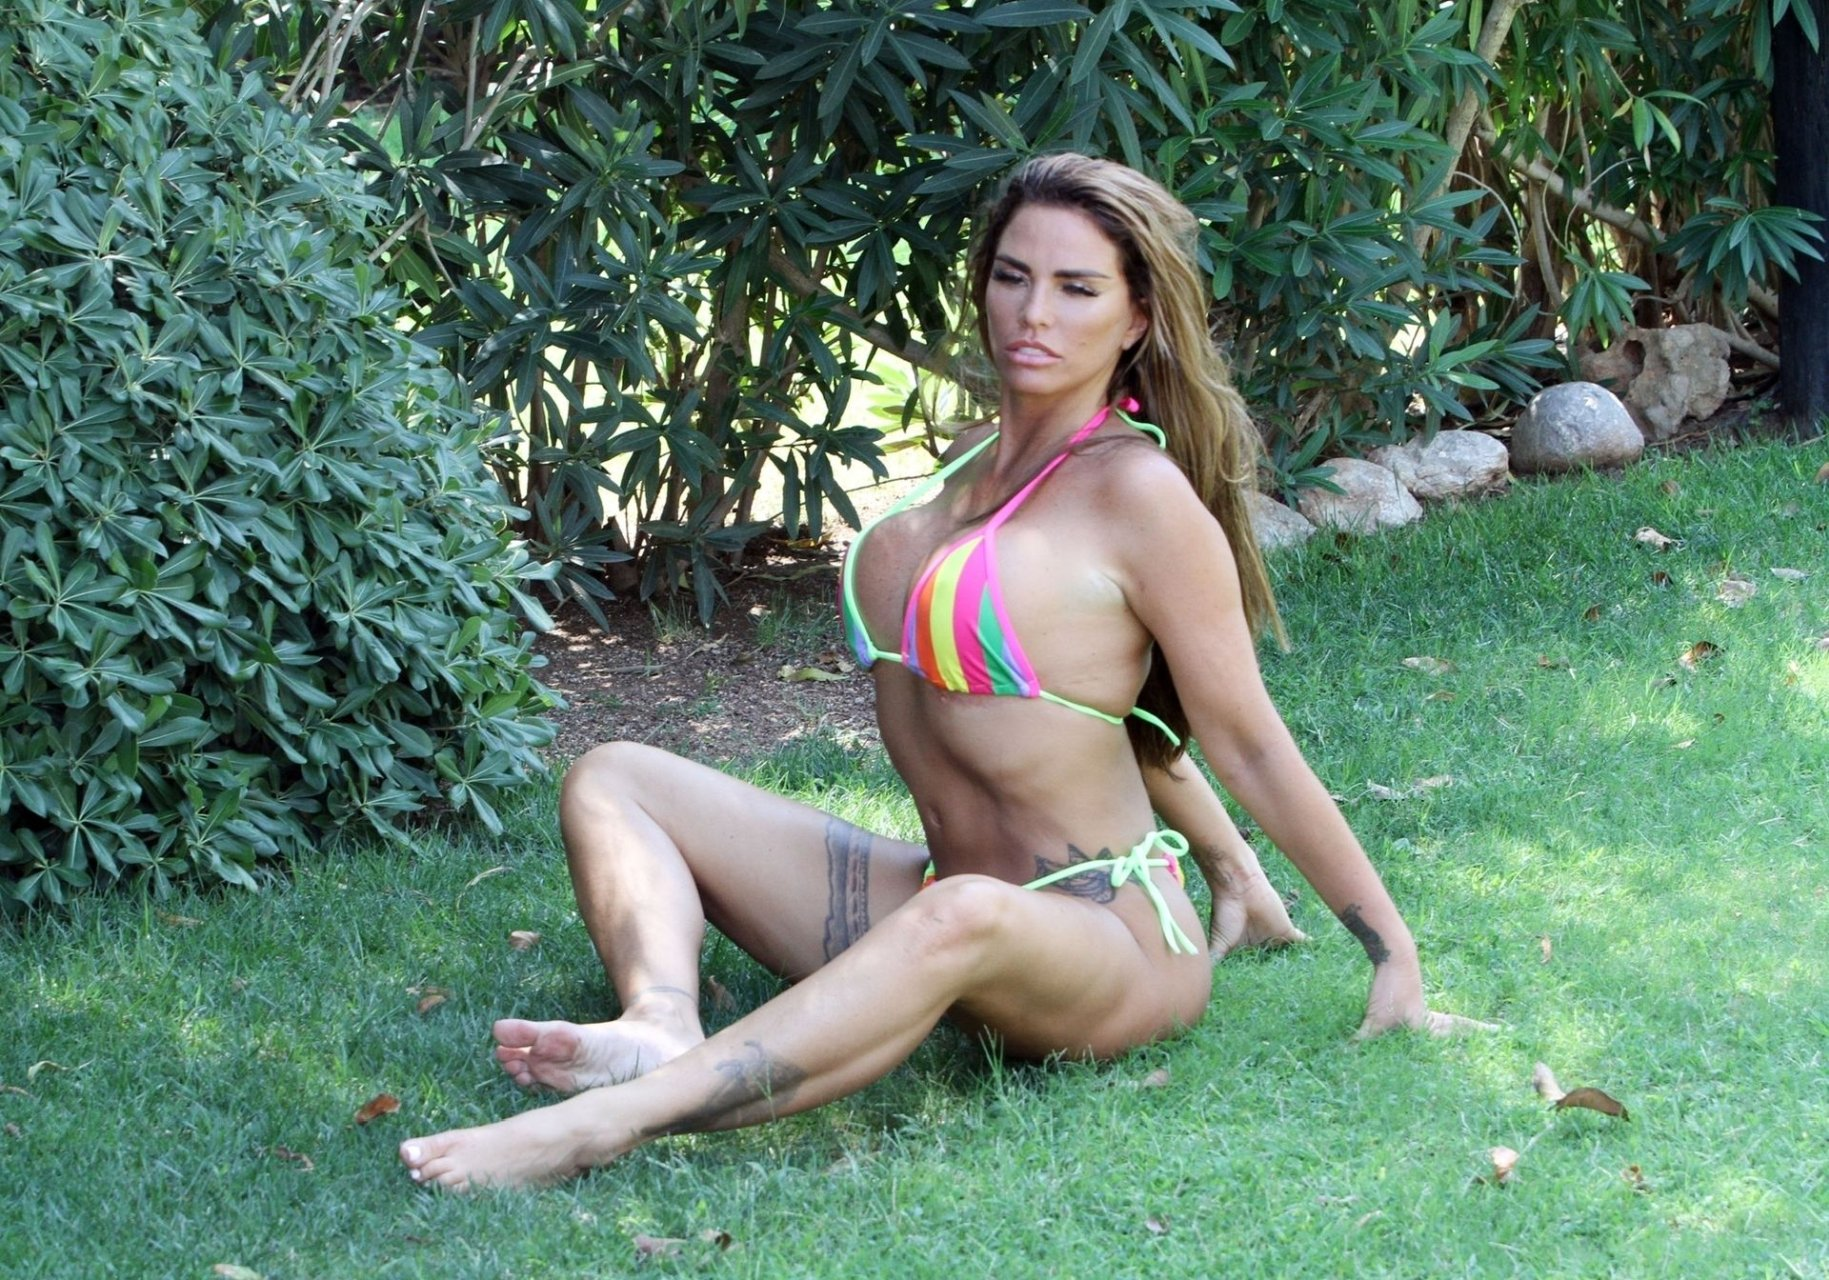 Katie-Price-Nude-Sexy-TheFappeningBlog.com-65.jpg